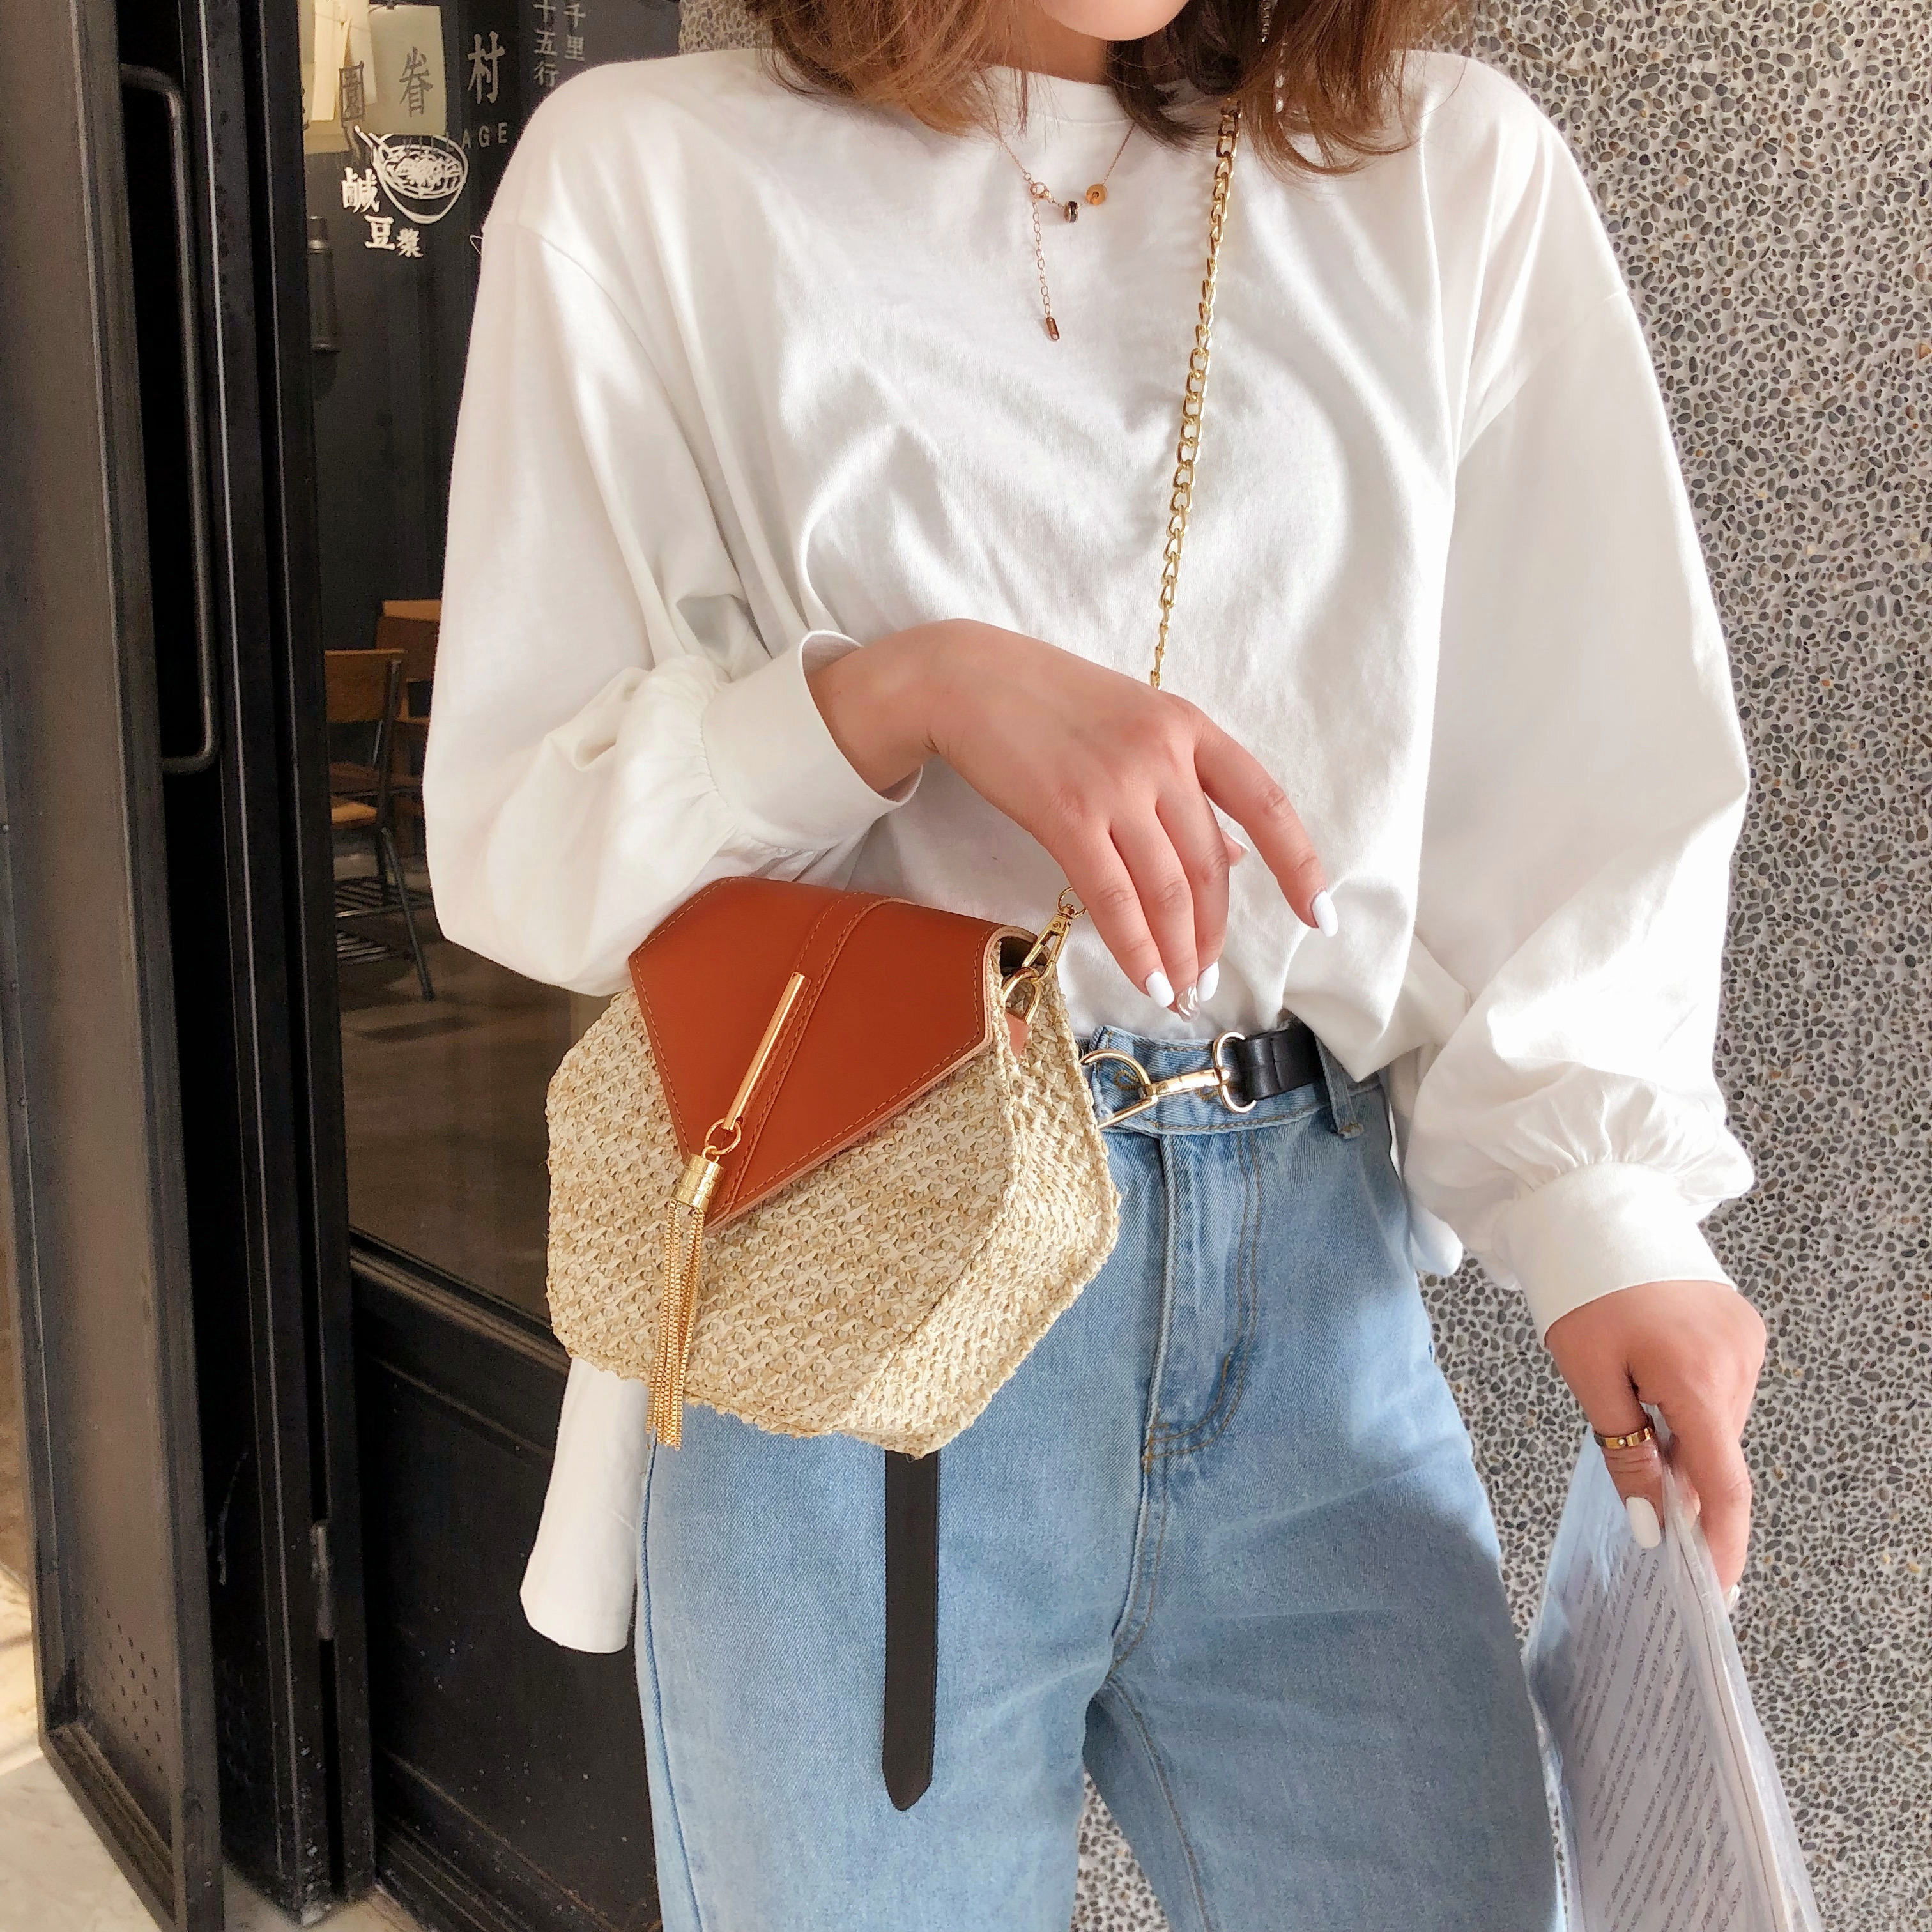 Hexagon Mulit Style Straw+leather Handbag Women Summer Rattan Bag Handmade Woven Beach Circle Bohemia Shoulder Bag New Fashion 5